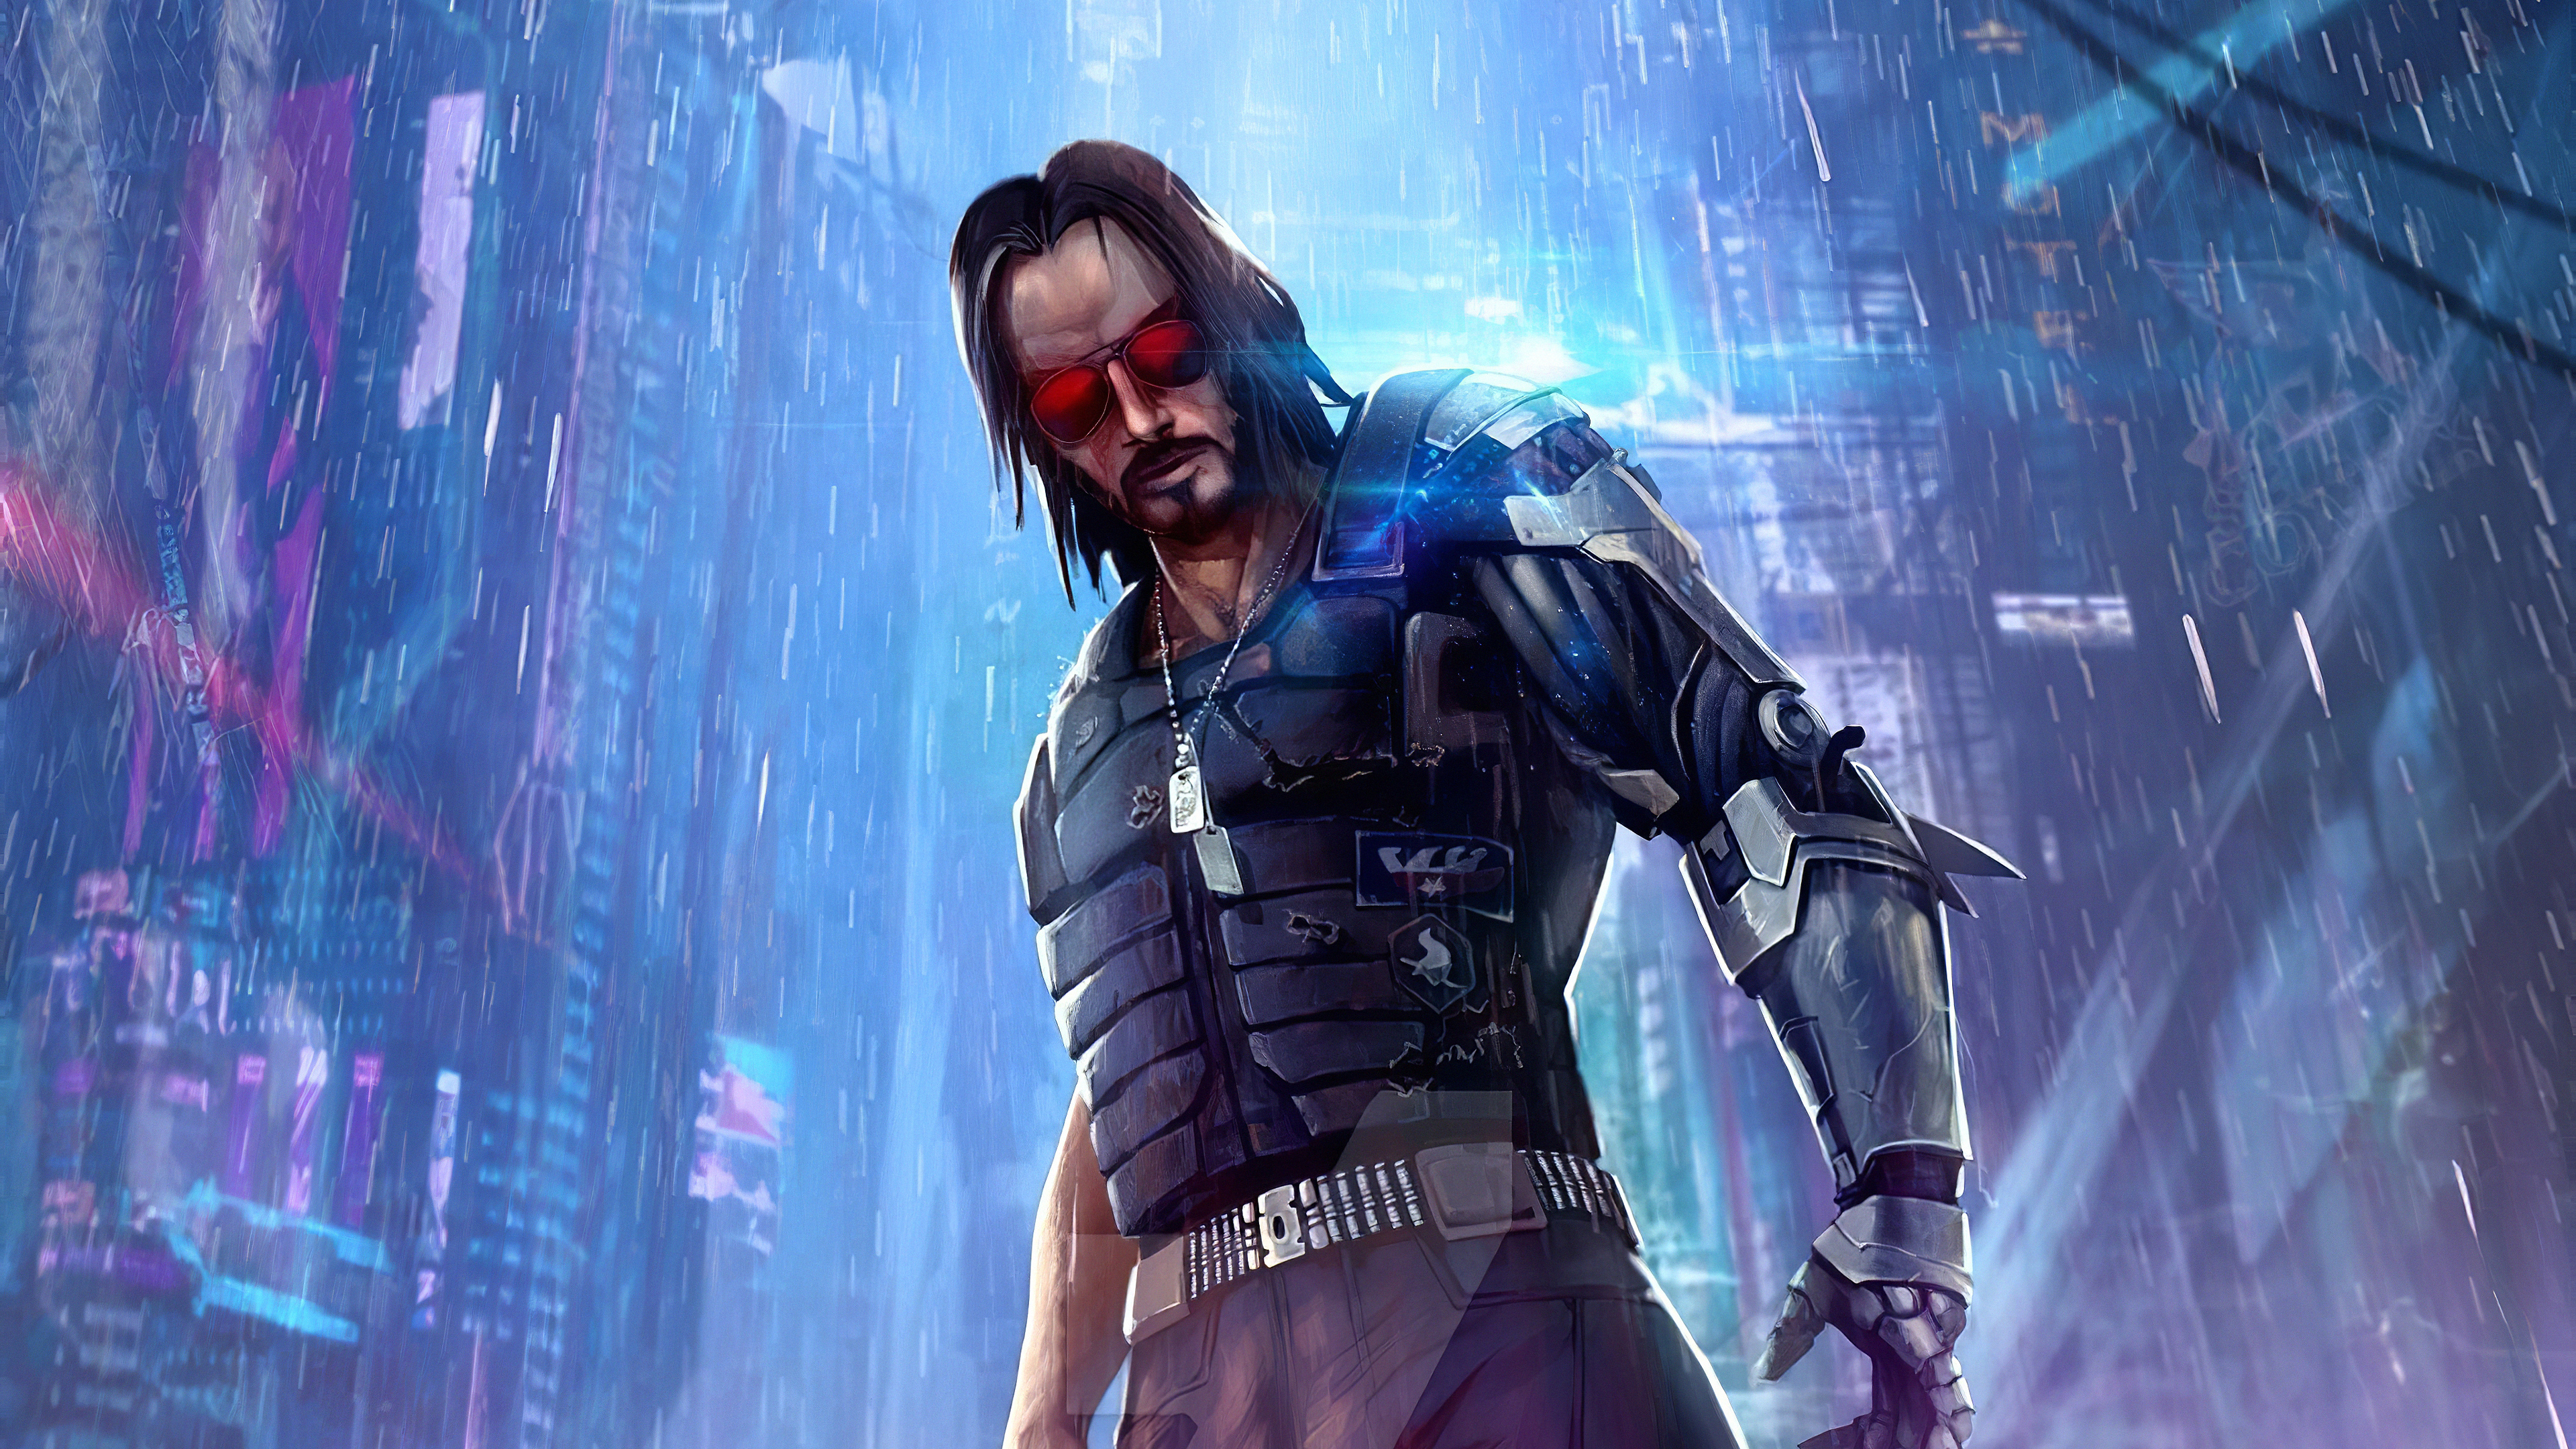 Cyberpunk 2077 Keanu, HD Games, 4k Wallpapers, Images ...